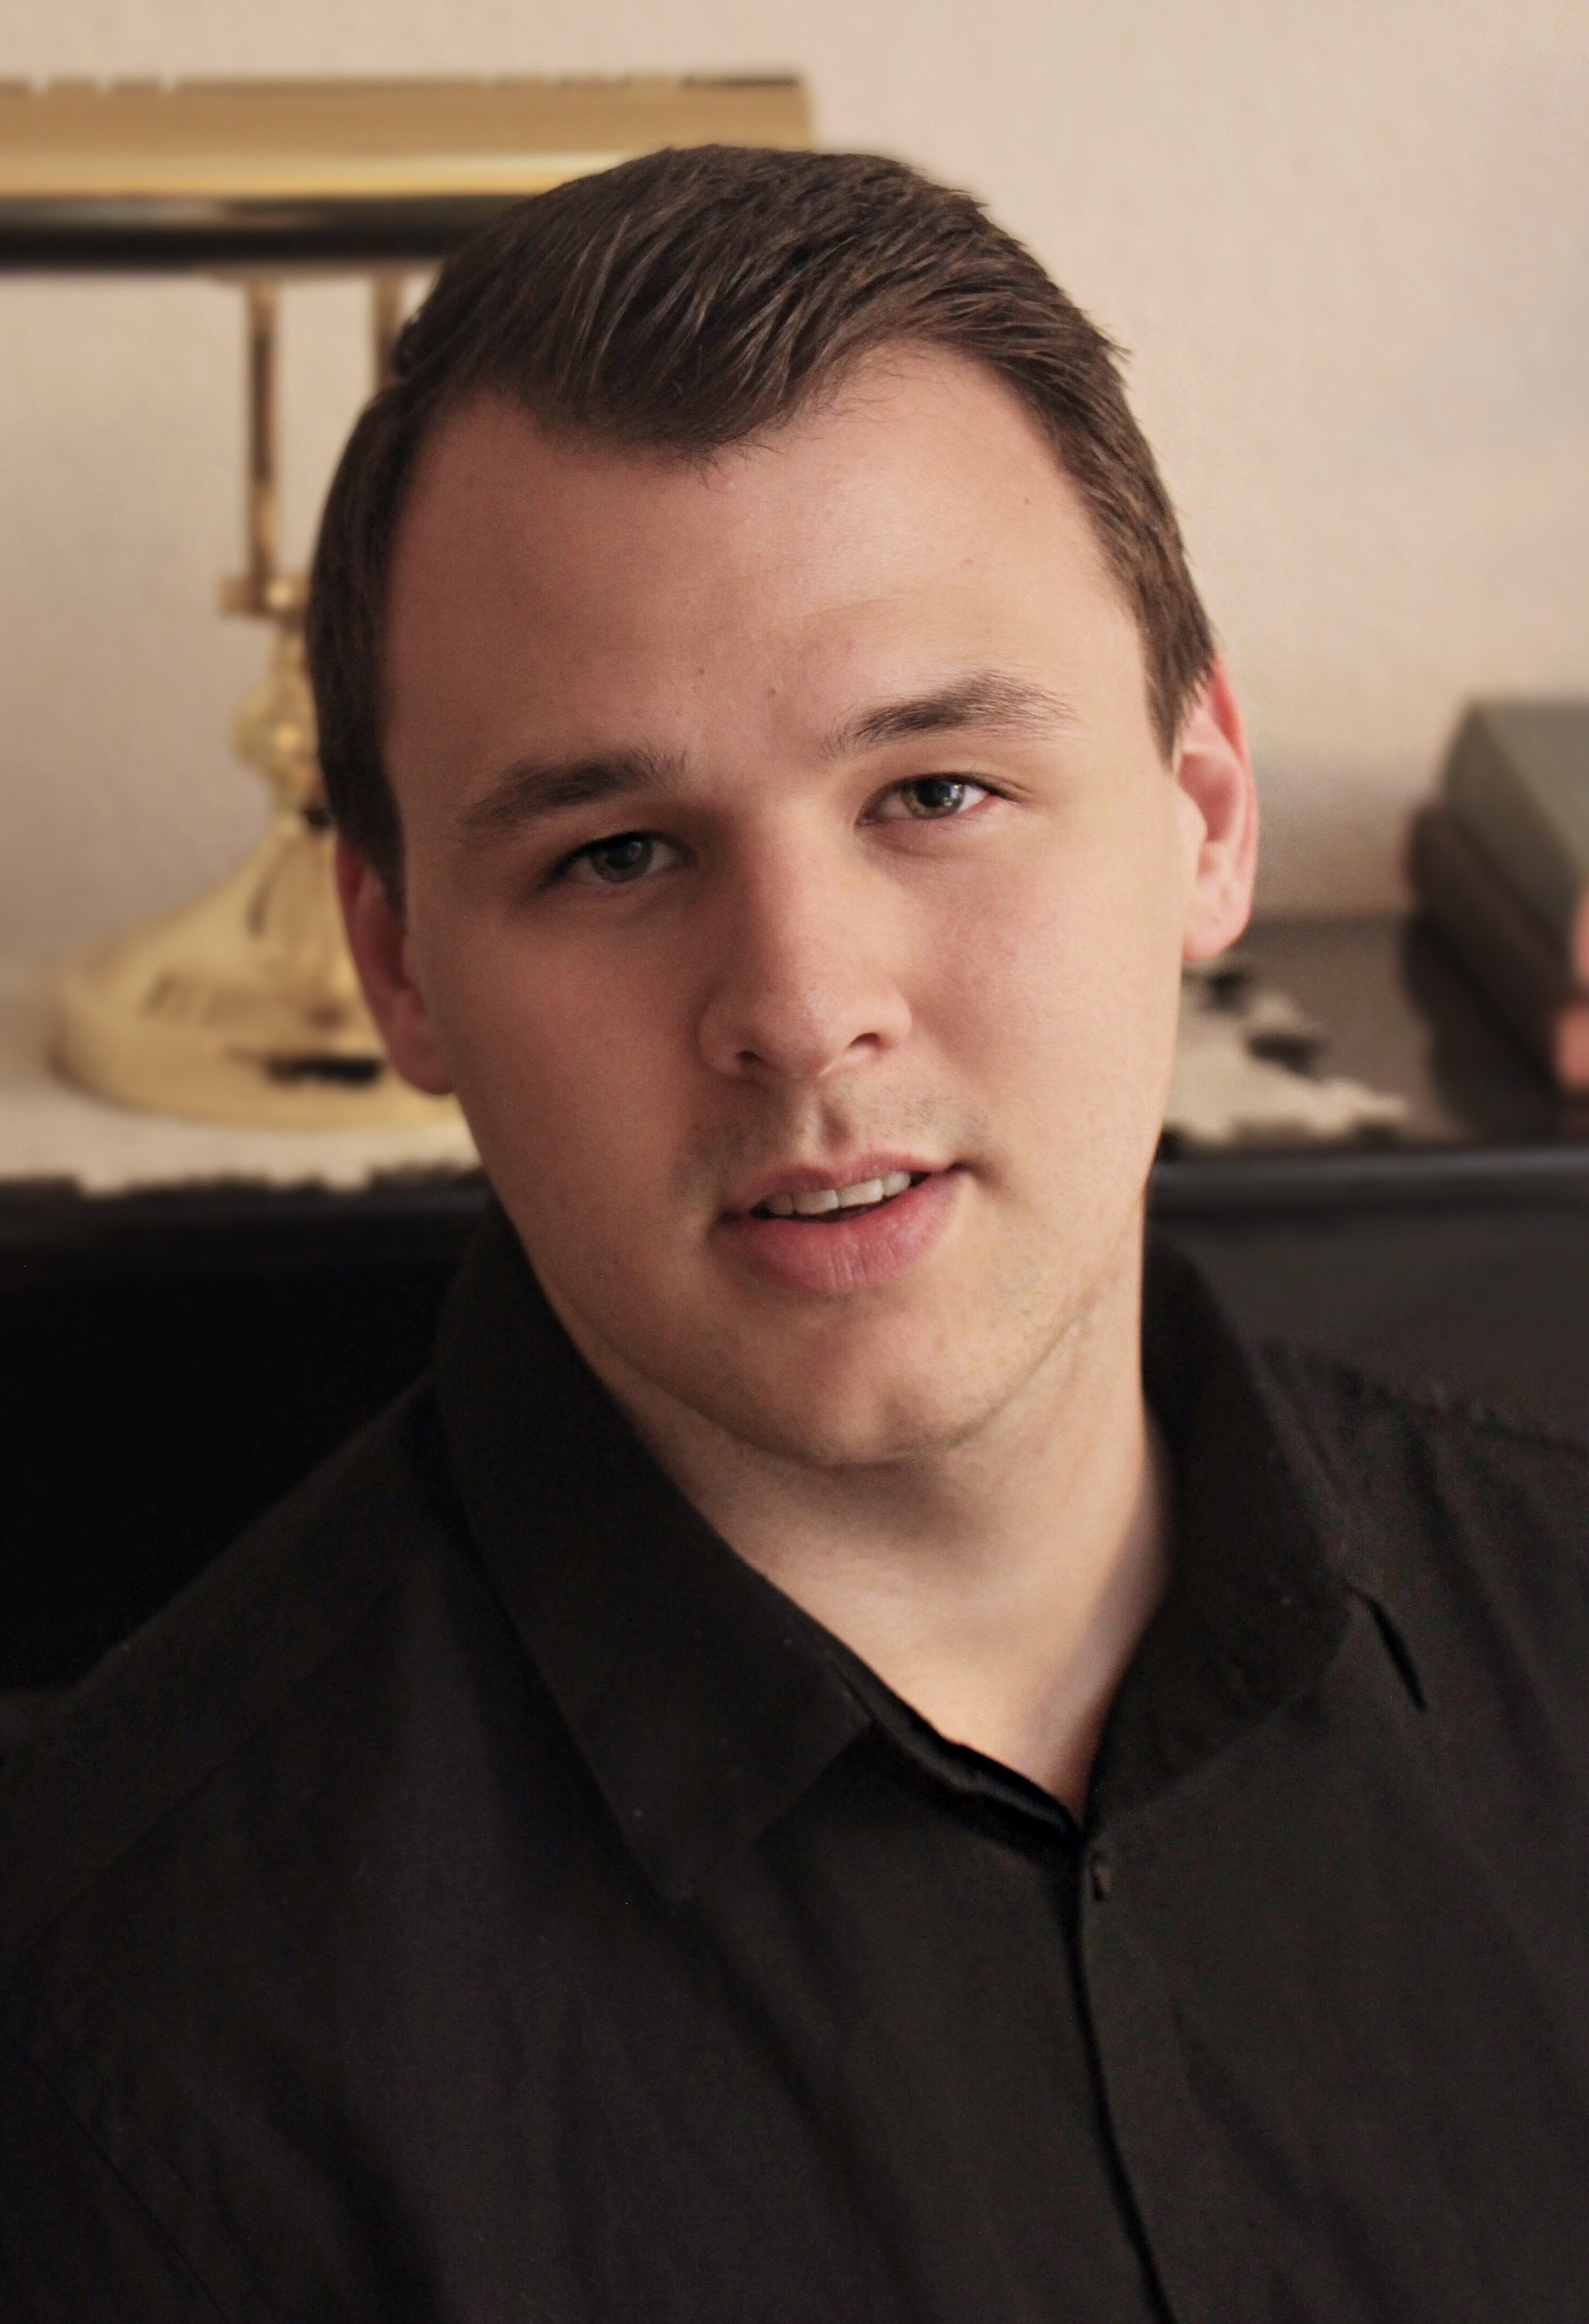 Nathan Hodgson Headshot.jpeg